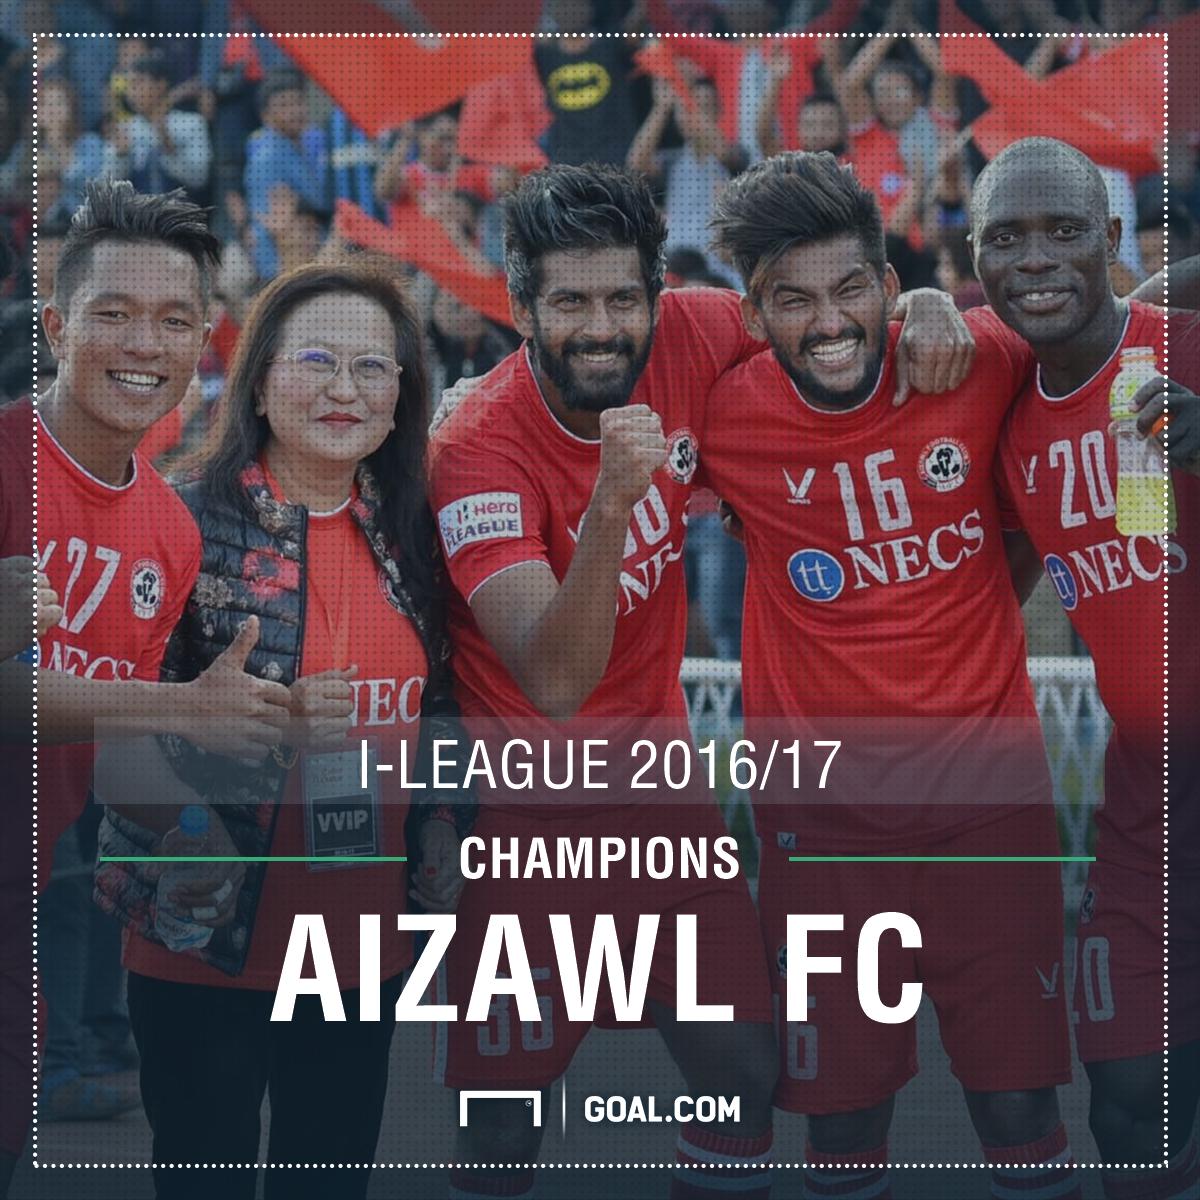 Aizawl I-League 2017 Champions PS